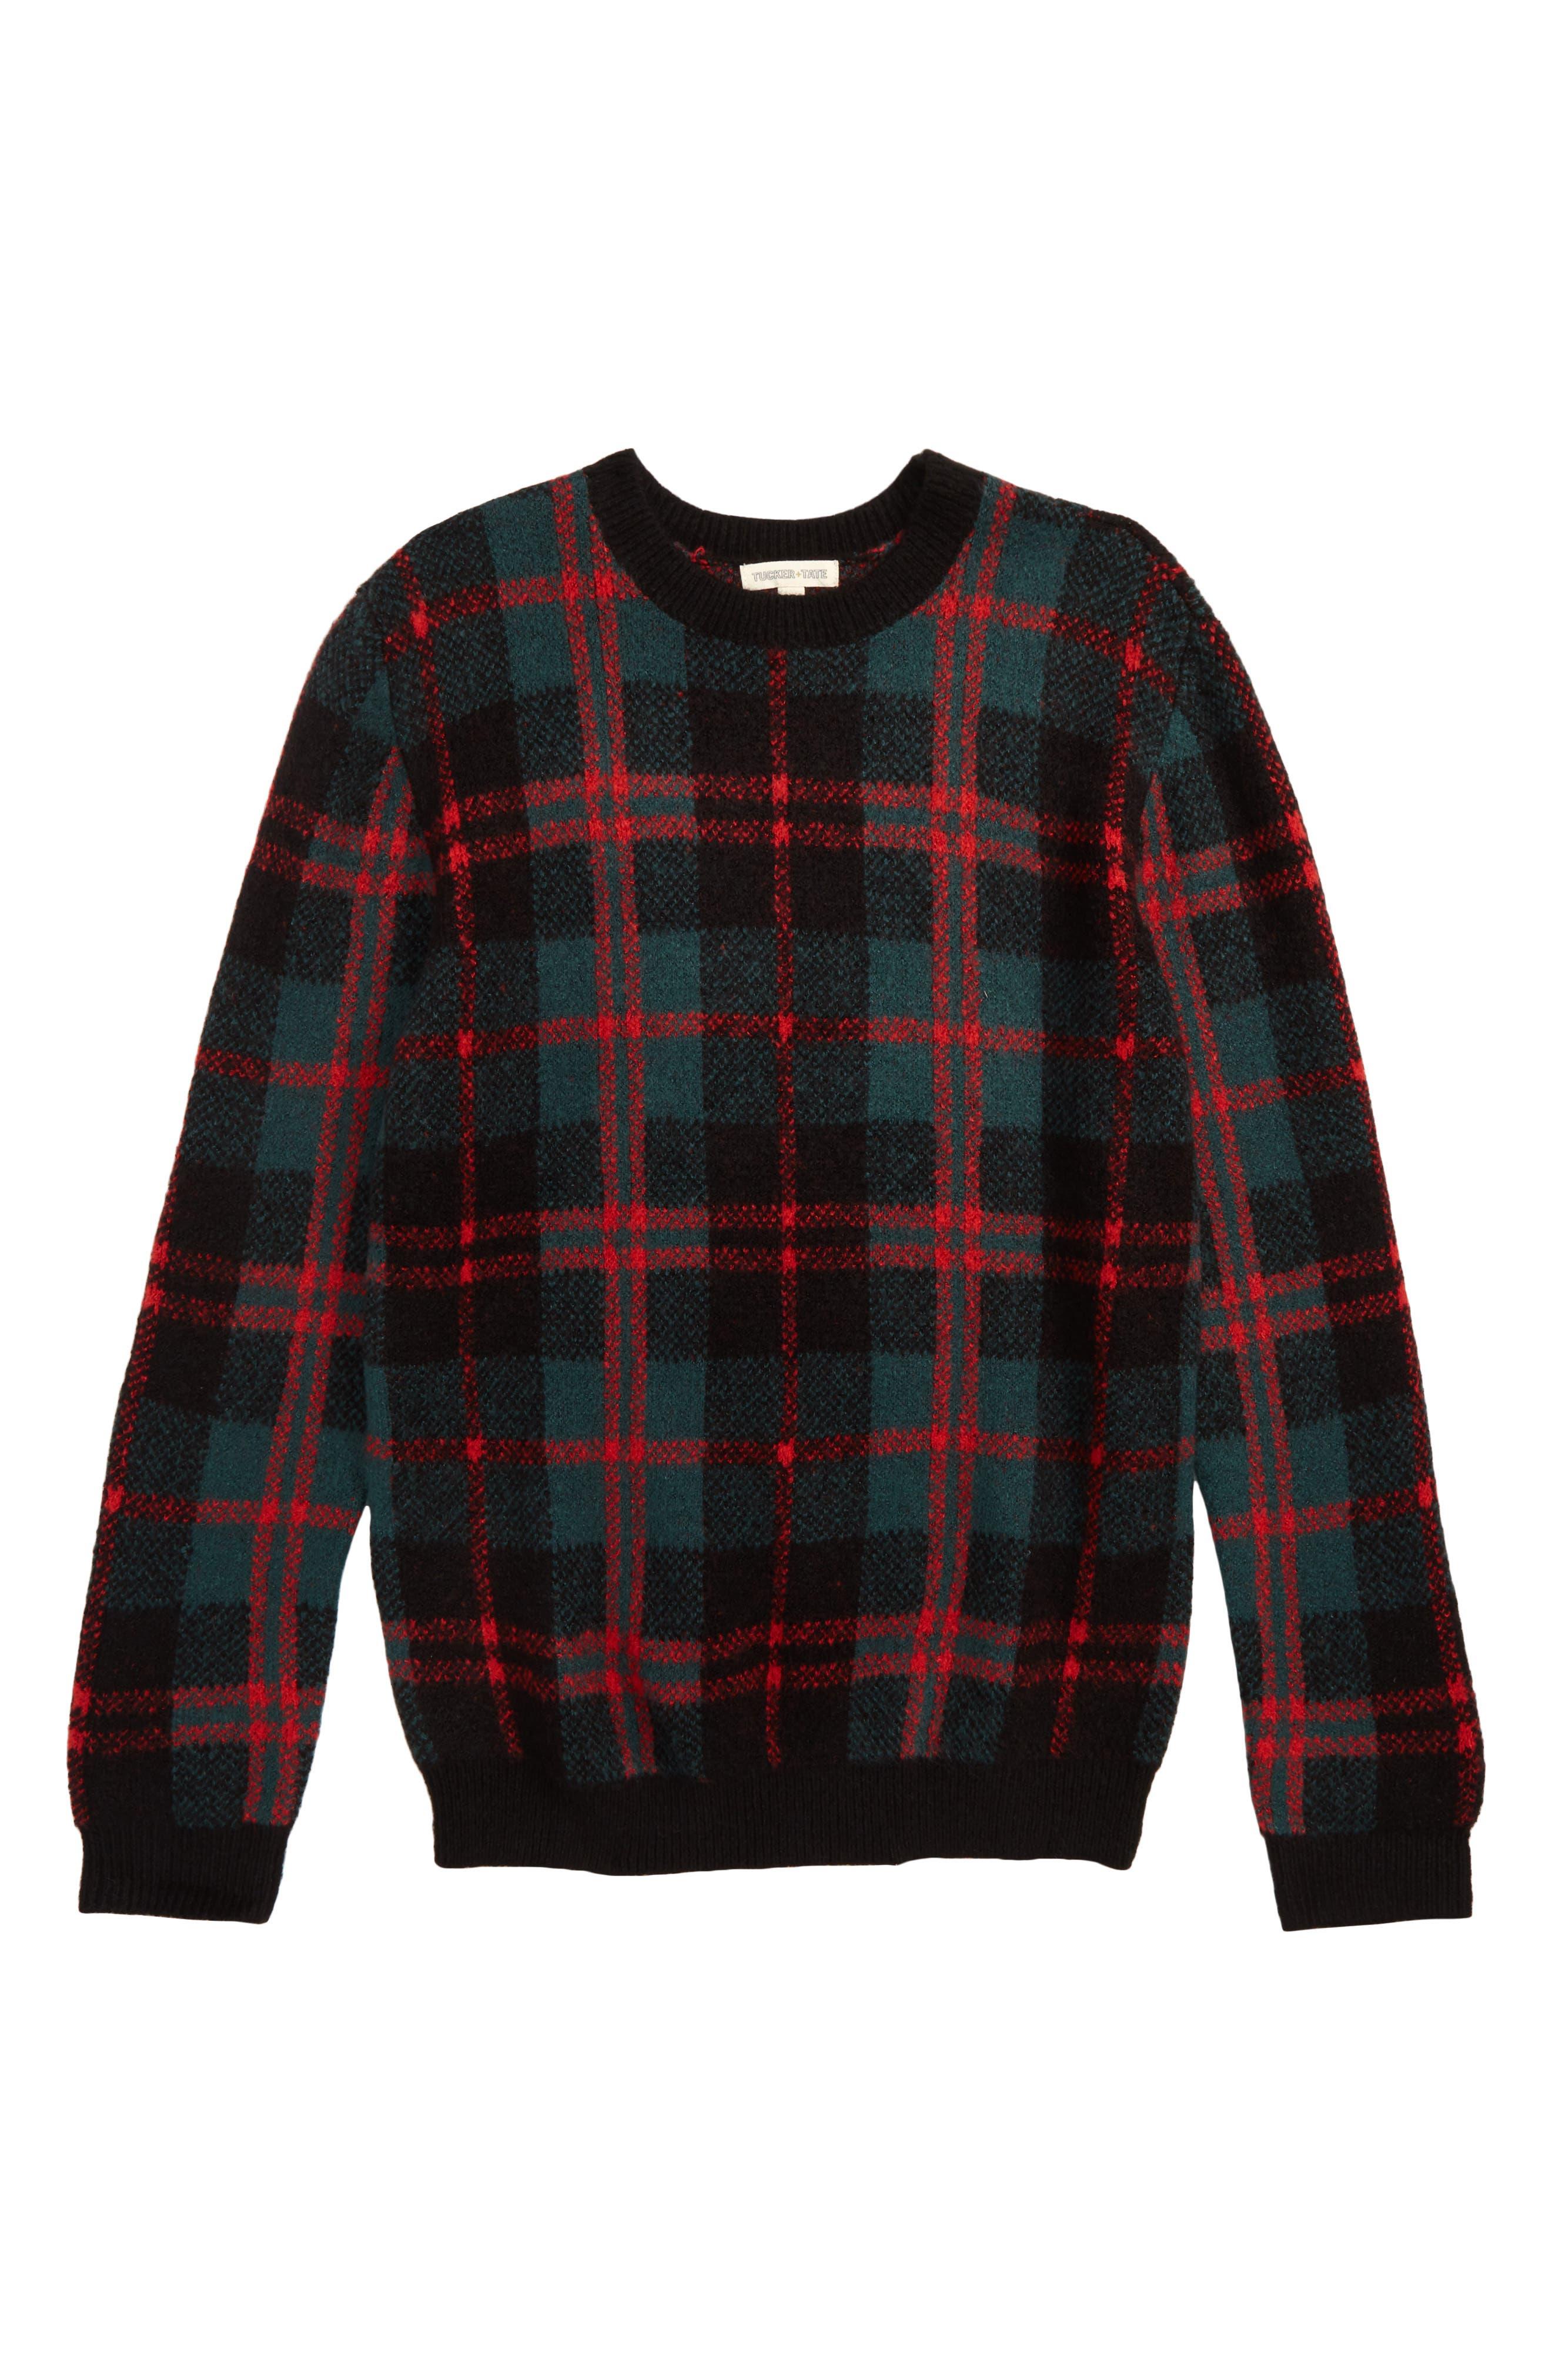 Tartan Plaid Sweater,                         Main,                         color, GREEN BUG WINDOWPANE PLAID